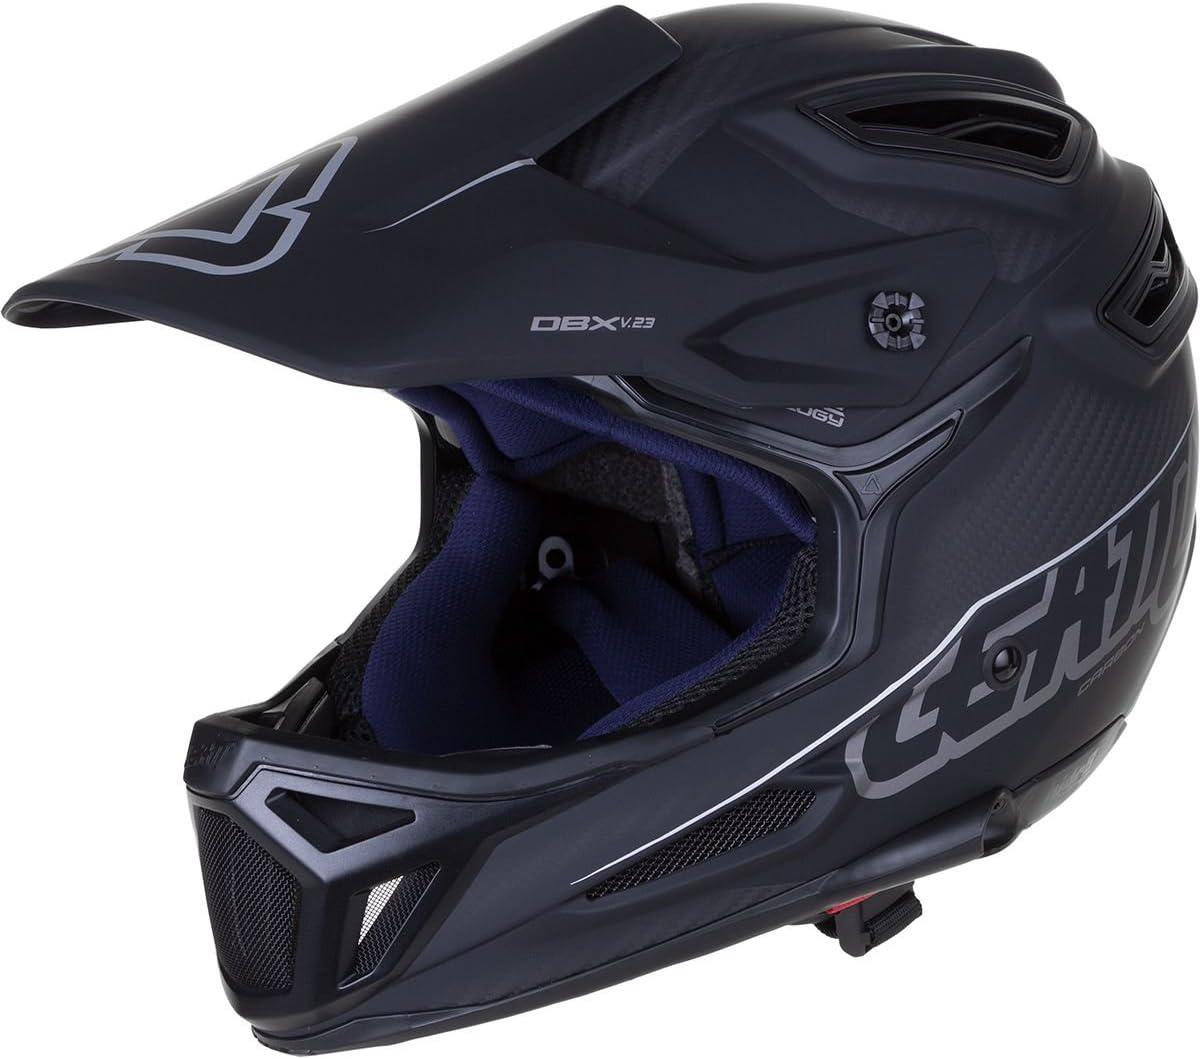 Leatt DBX 6.0カーボンV23自転車用ヘルメット-XL